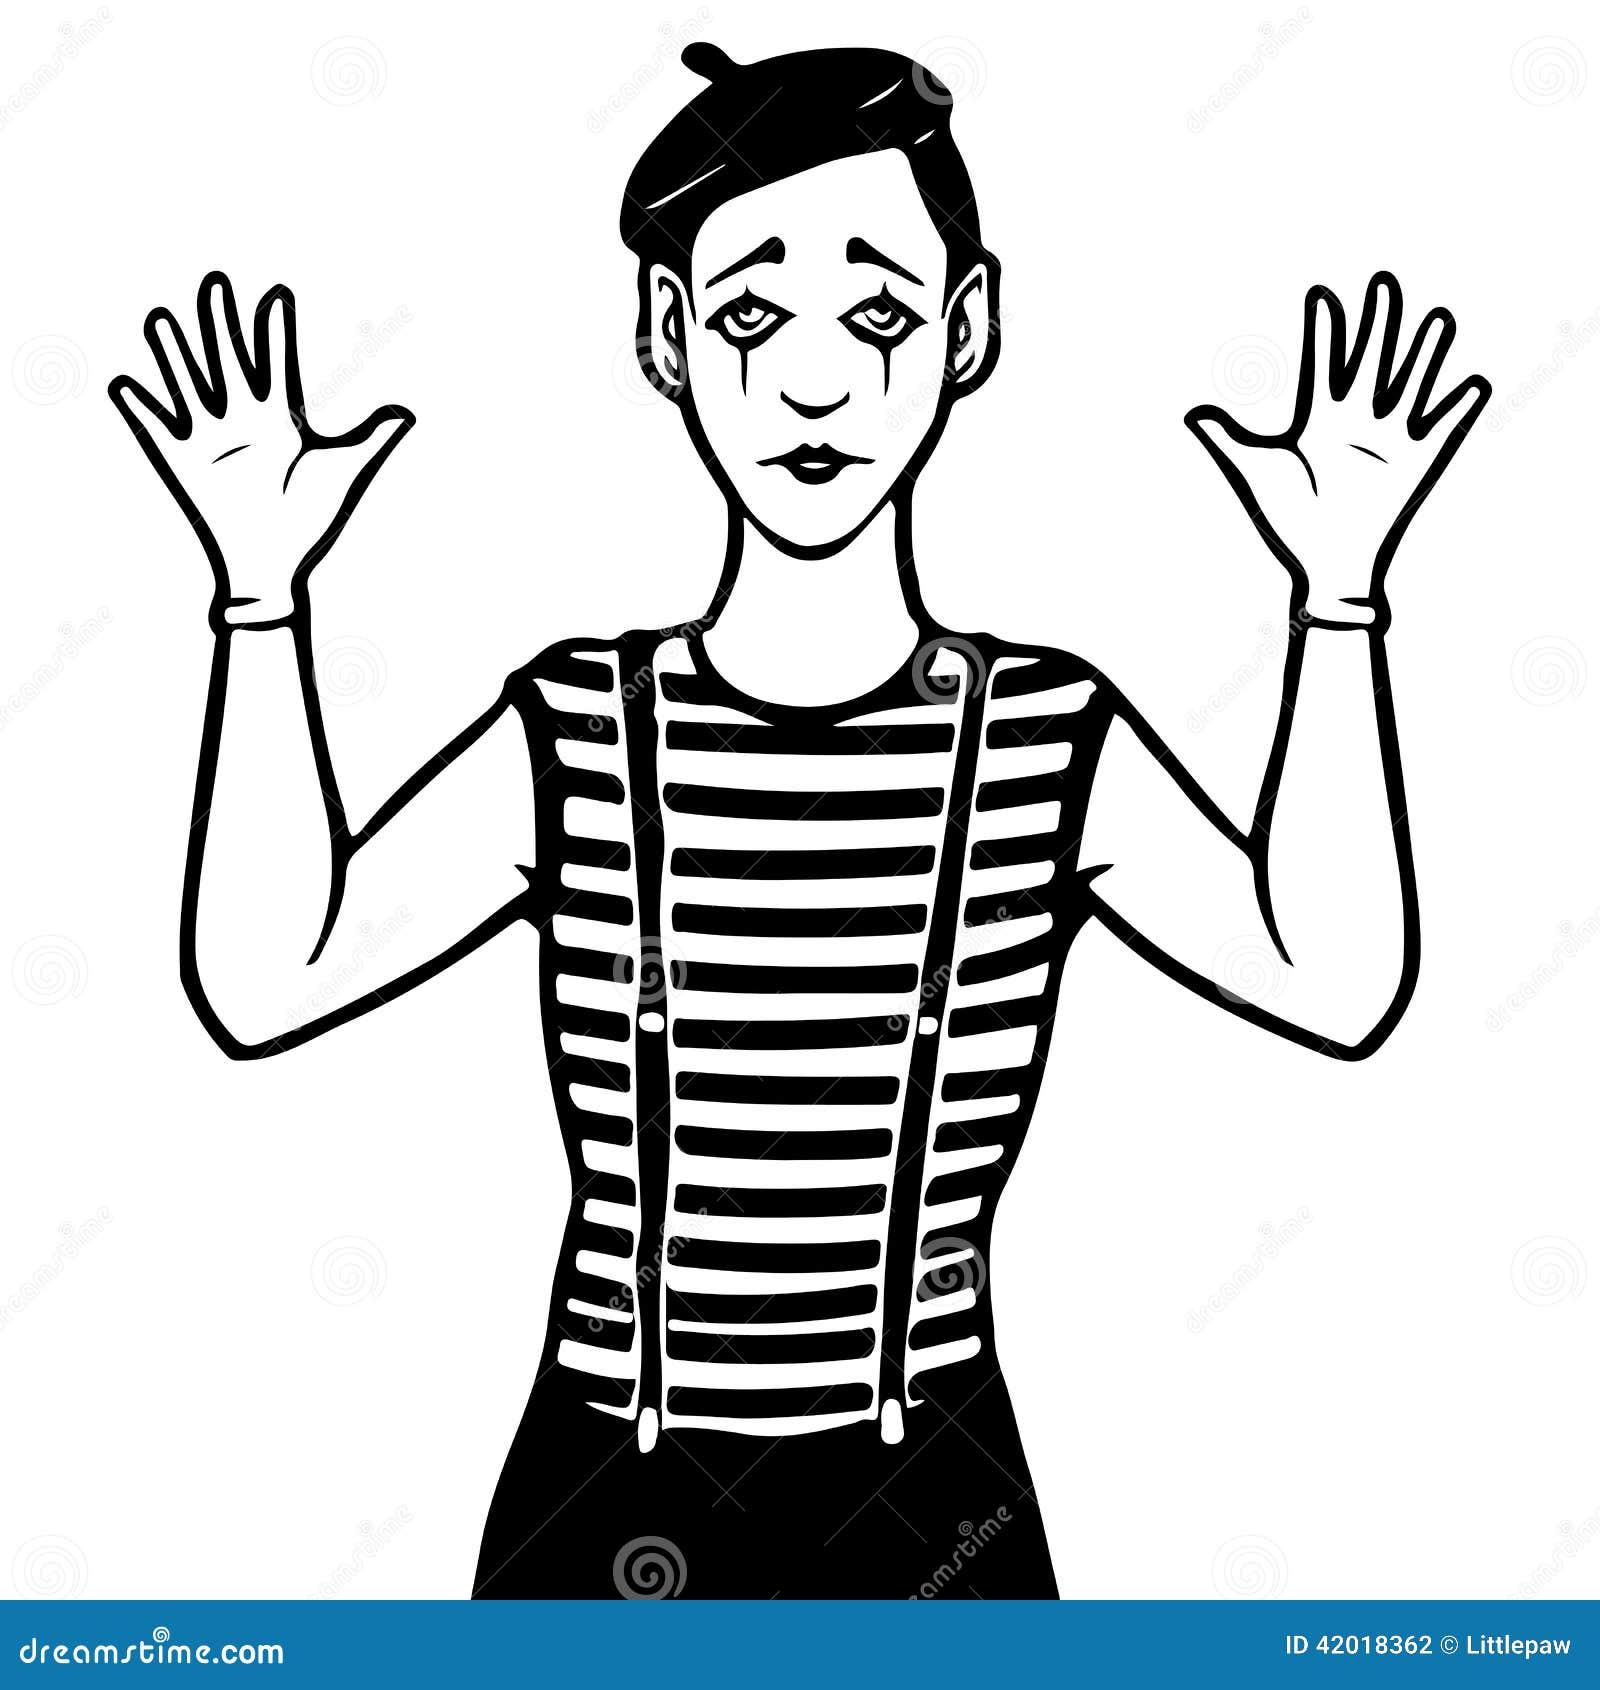 Line Art With Mr E : Mime illustration stock vector of stripe